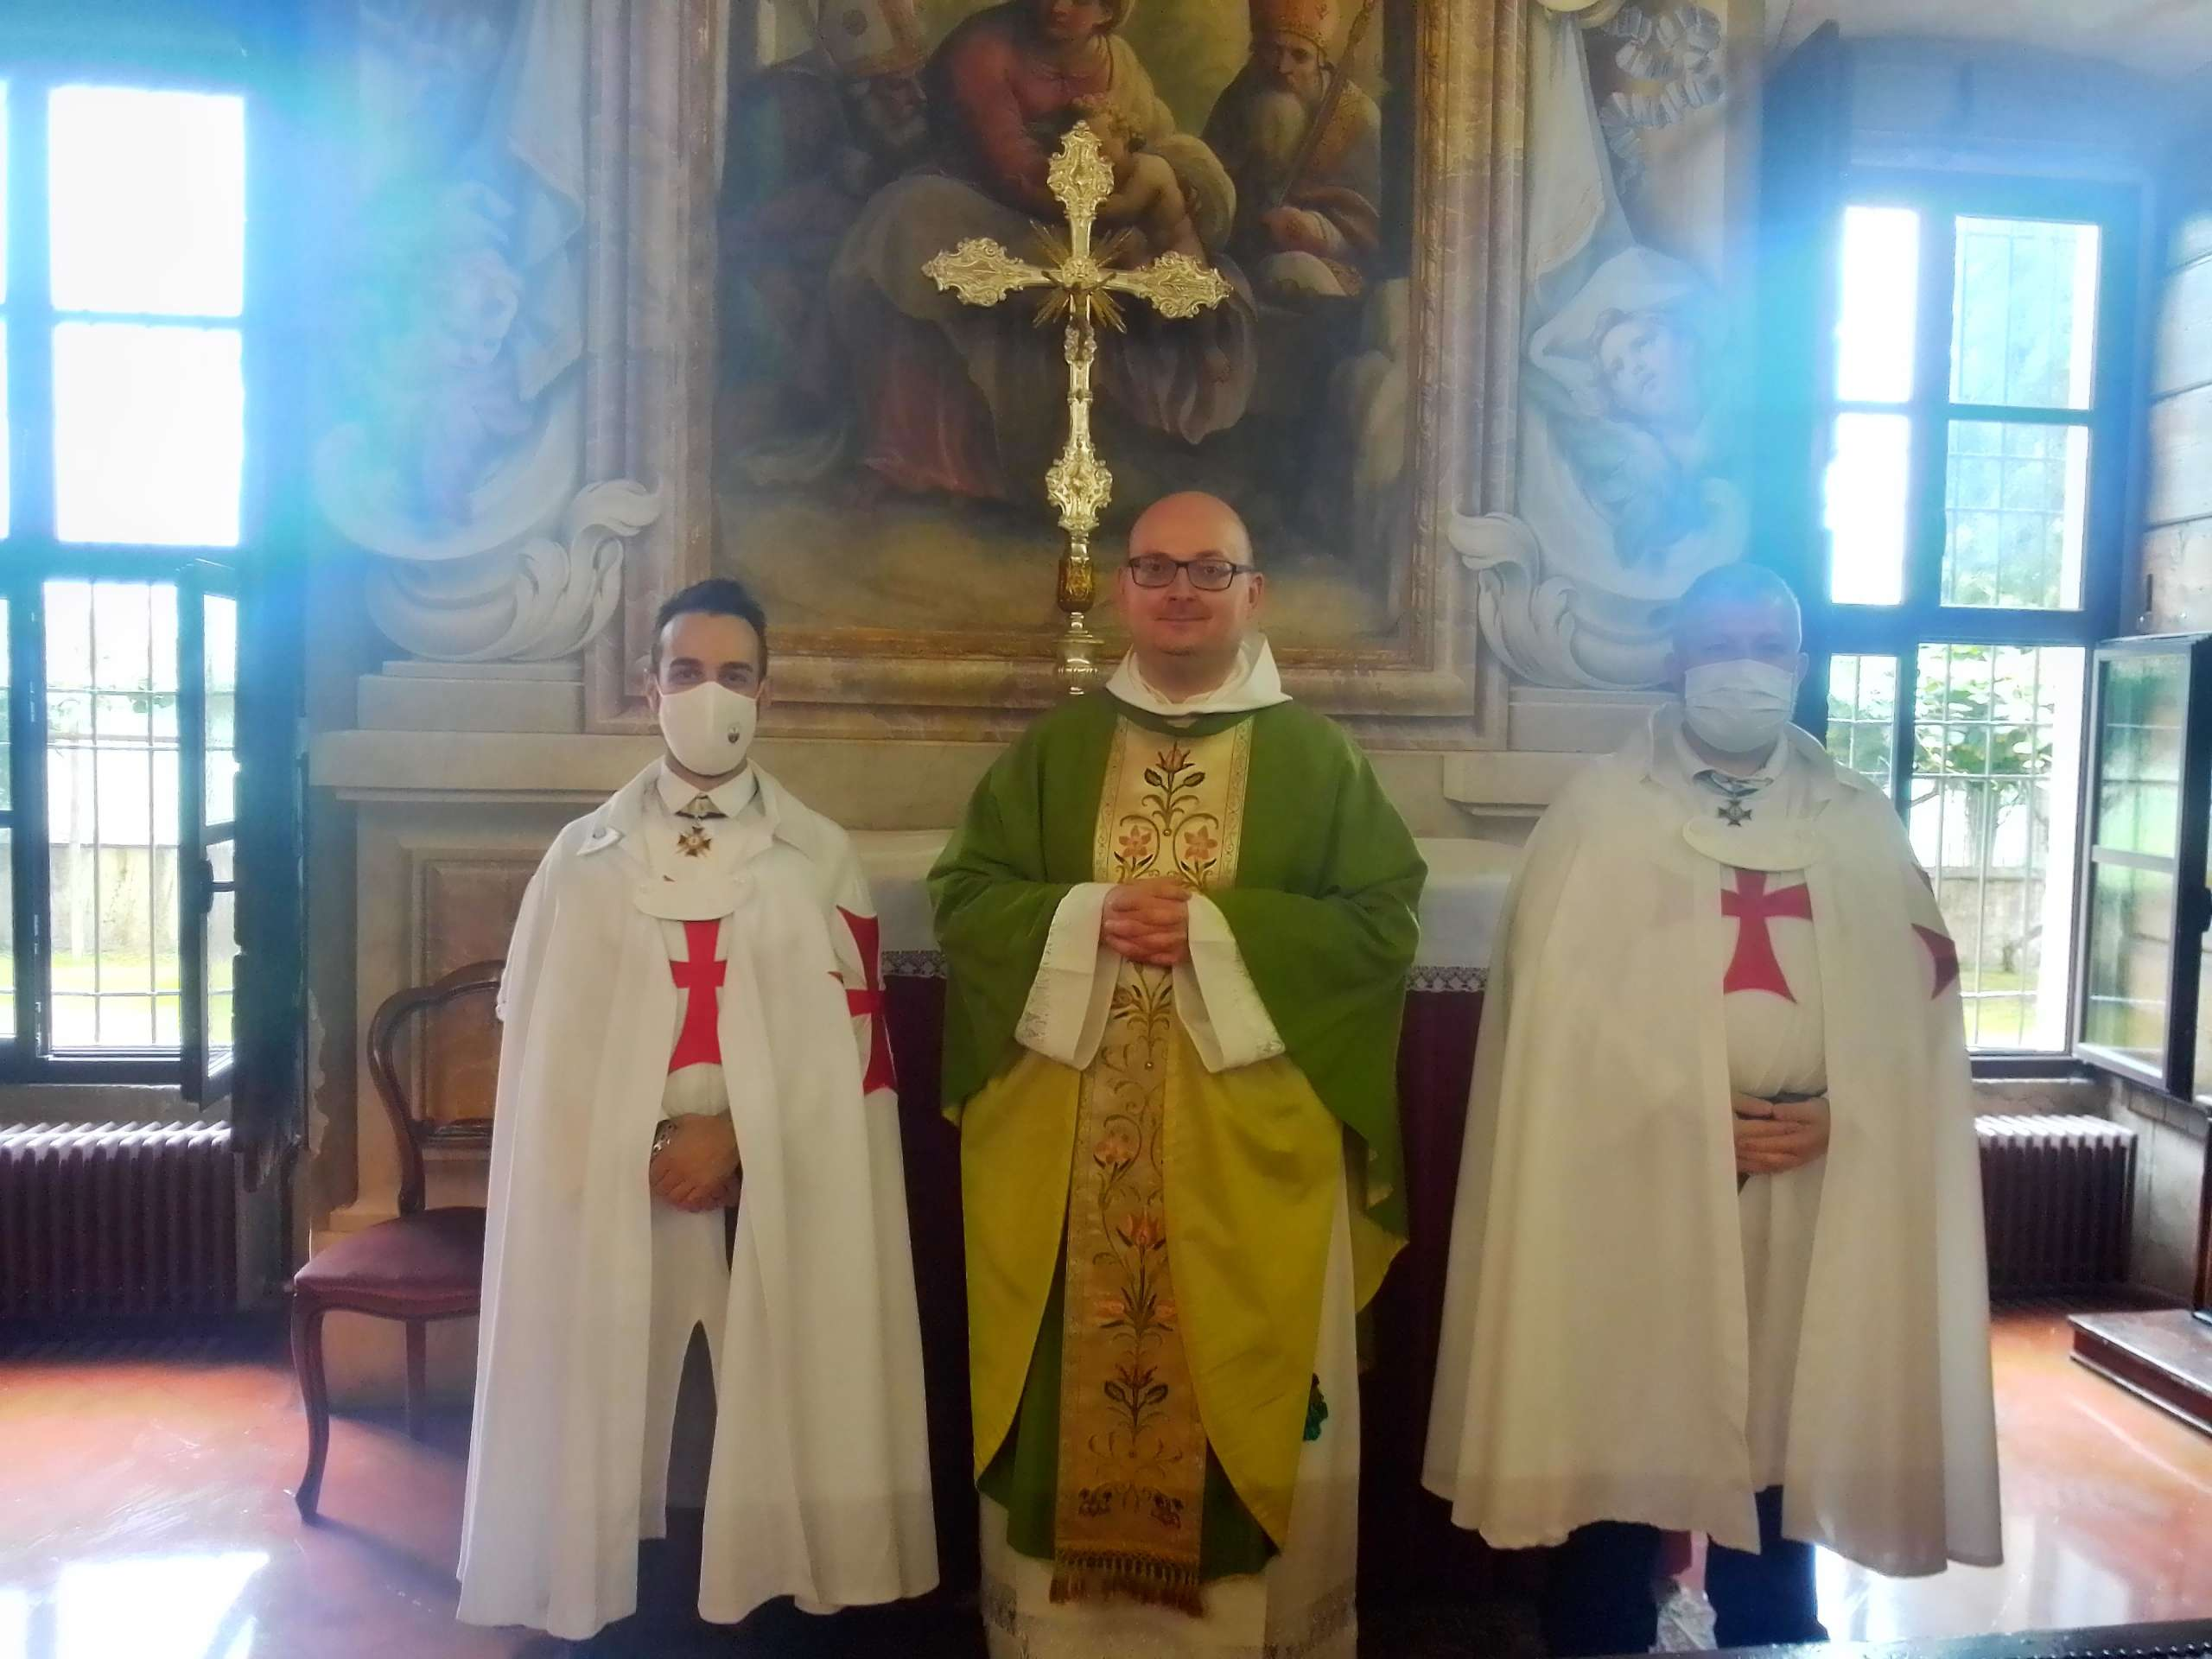 Teilnahme an der Heiligen Messe – Kirche St. Nikolaus – Benediktiner-Olivetan-Abtei – Rodengo Saiano(BS) 04.07.2021